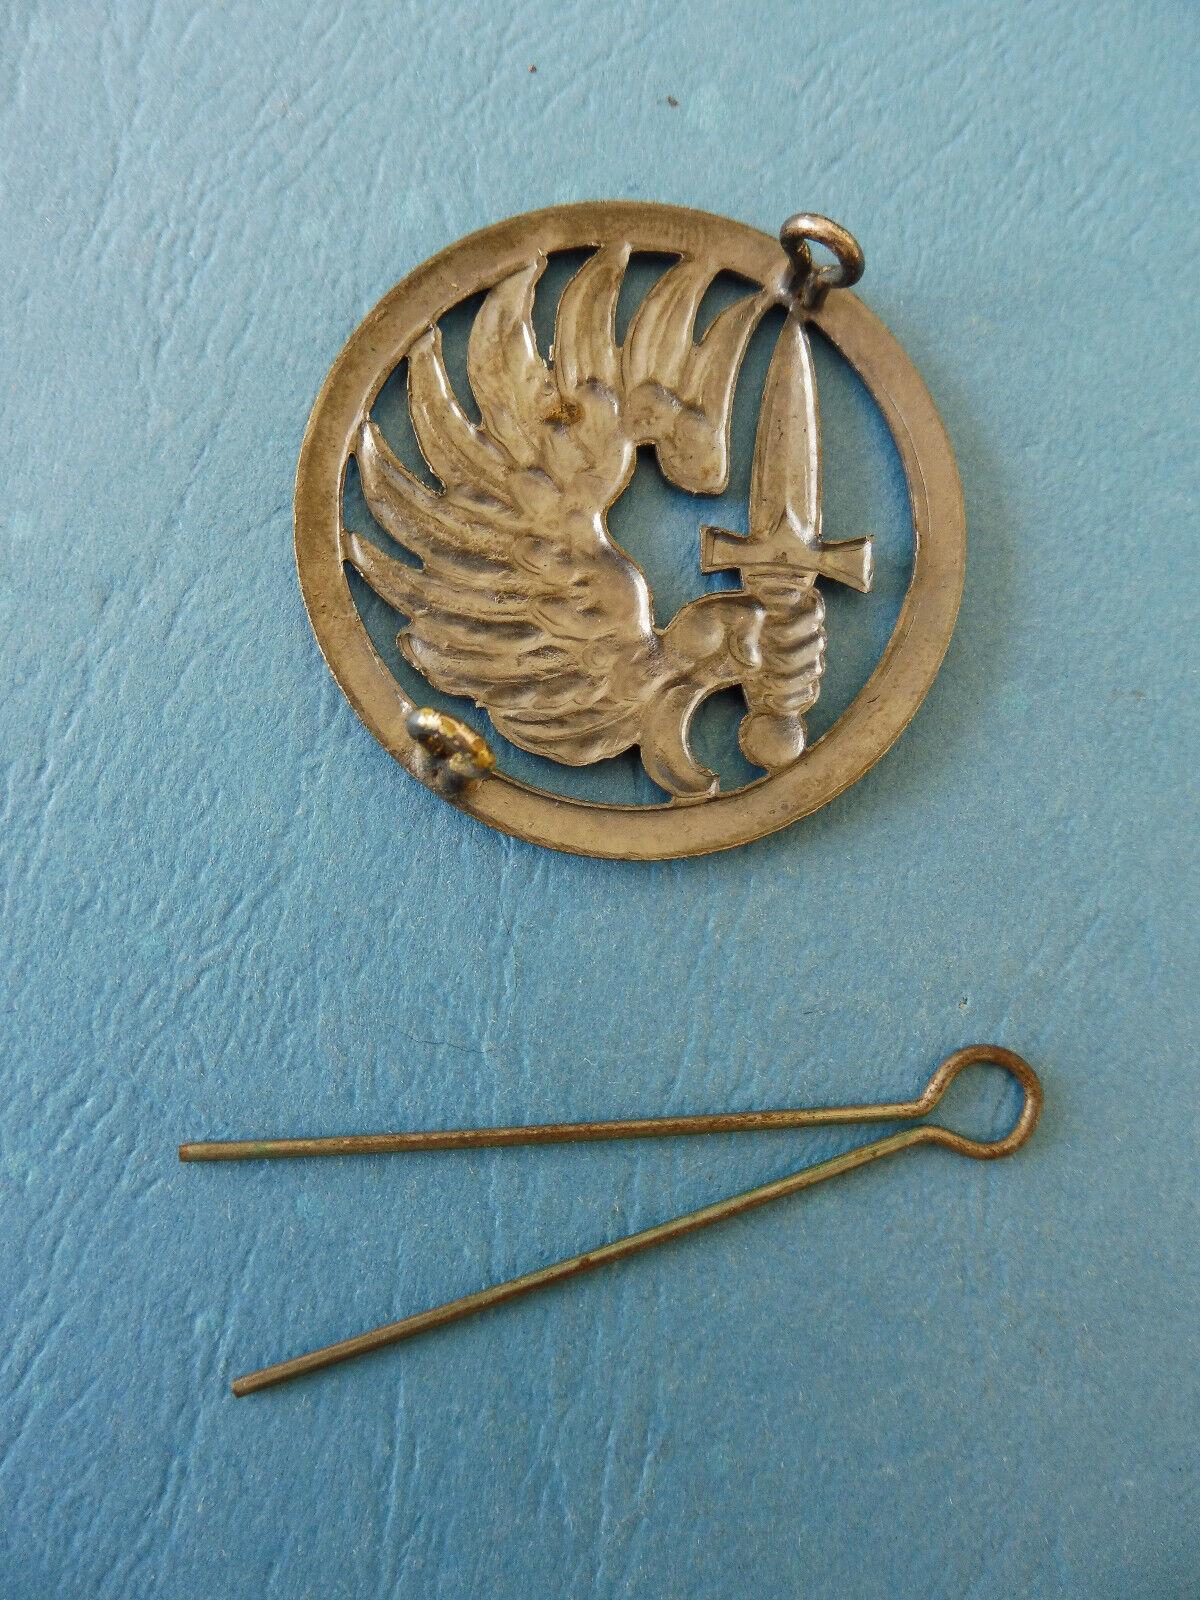 Indochine / beret parachutiste / amarante sas / insigne mourgeon / original